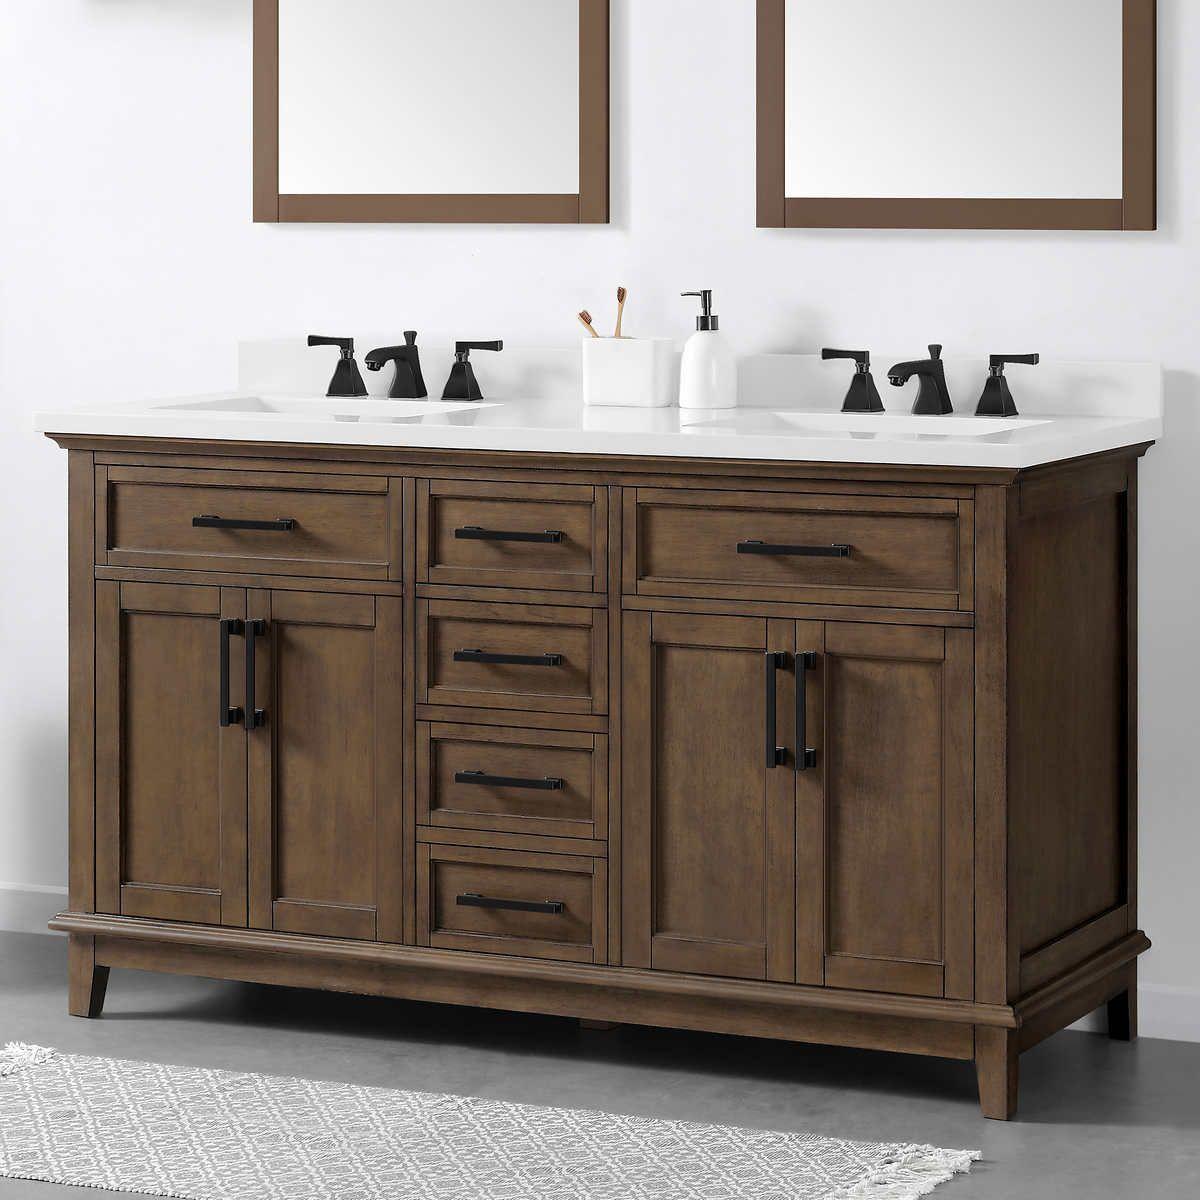 Ove Decors Dylan 60 Bath Vanity Double Vanity Bathroom Bathroom Vanity Bathroom Sink Vanity